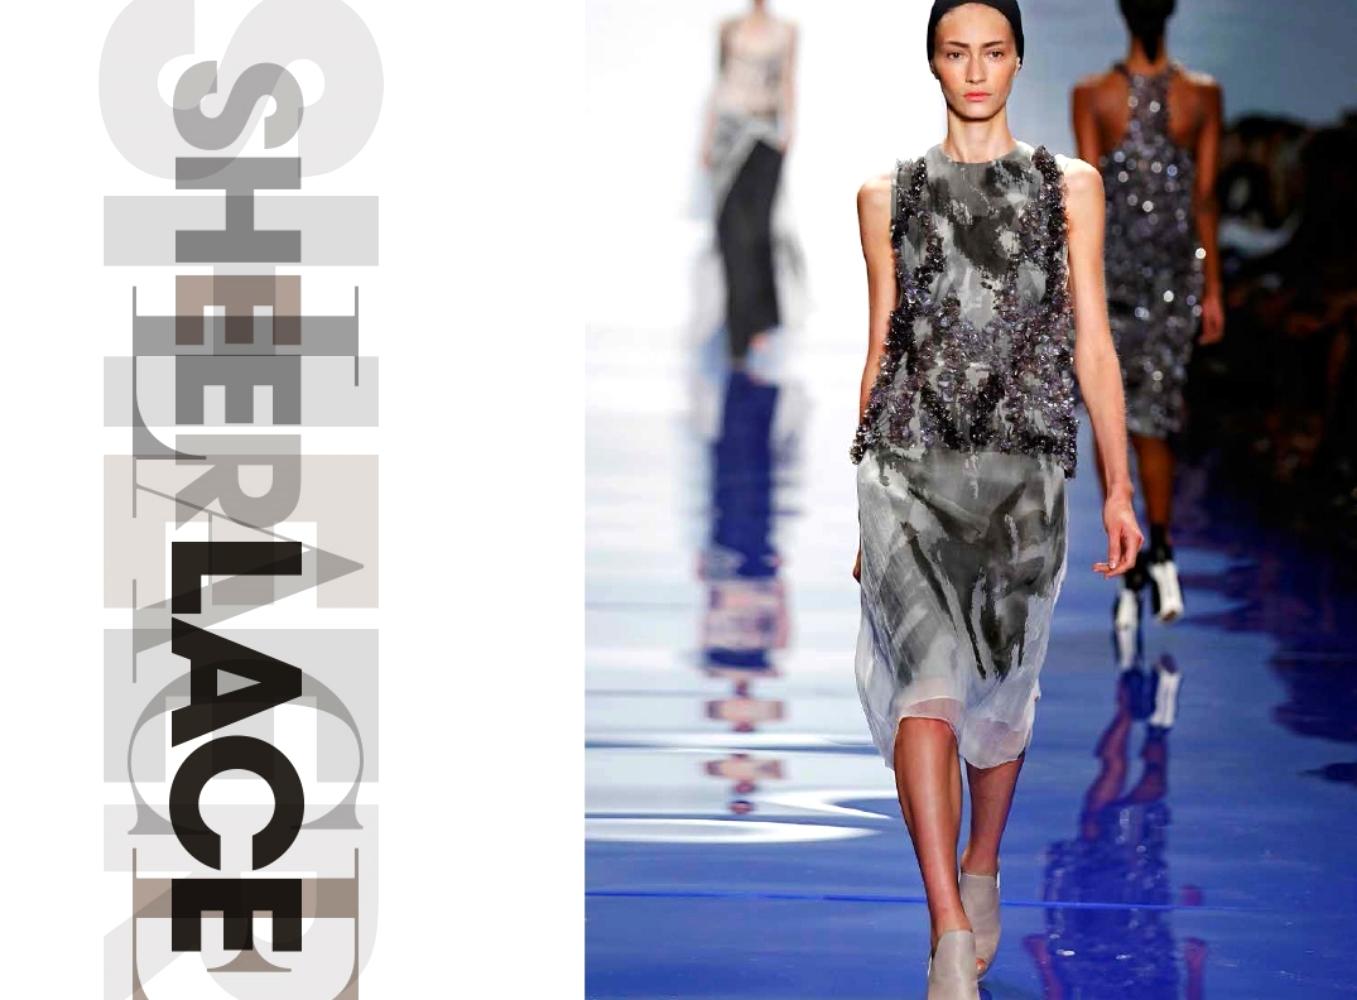 HSN Spring Fashion 9112013 28.jpg